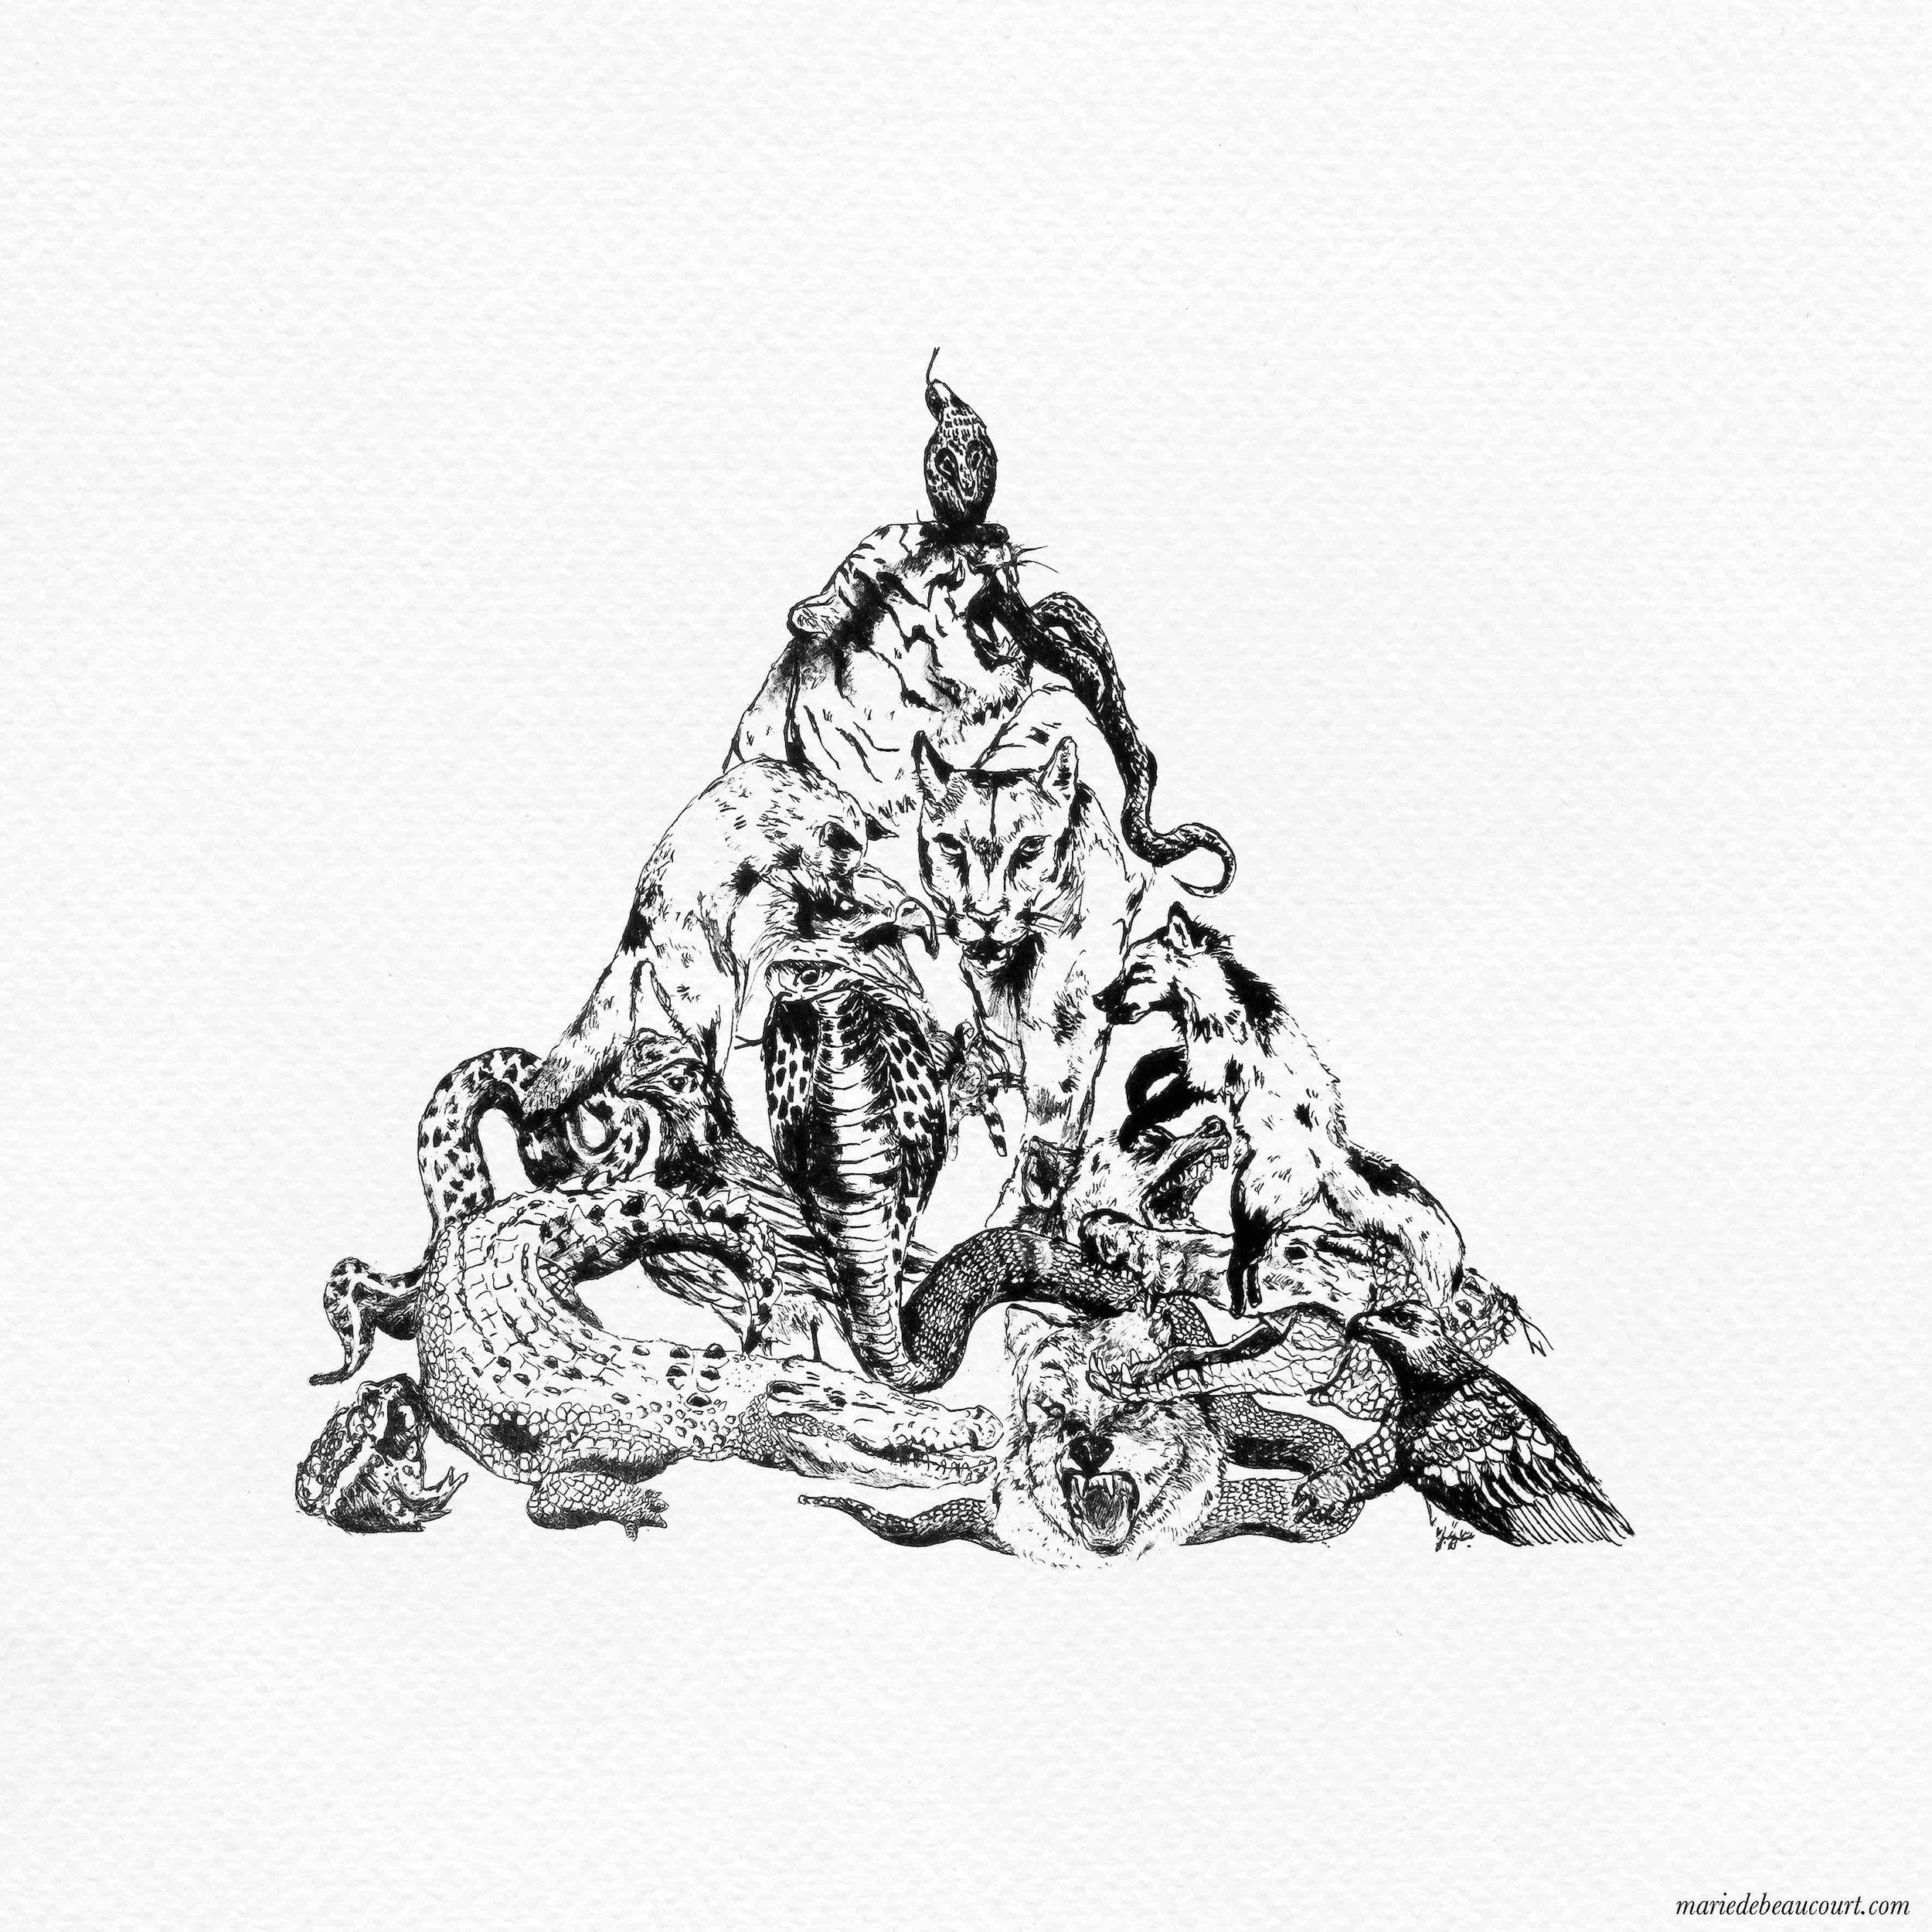 marie-de-beaucourt-illustration-animalia-triangle-predators-wolf-tiger-2017-web.jpg